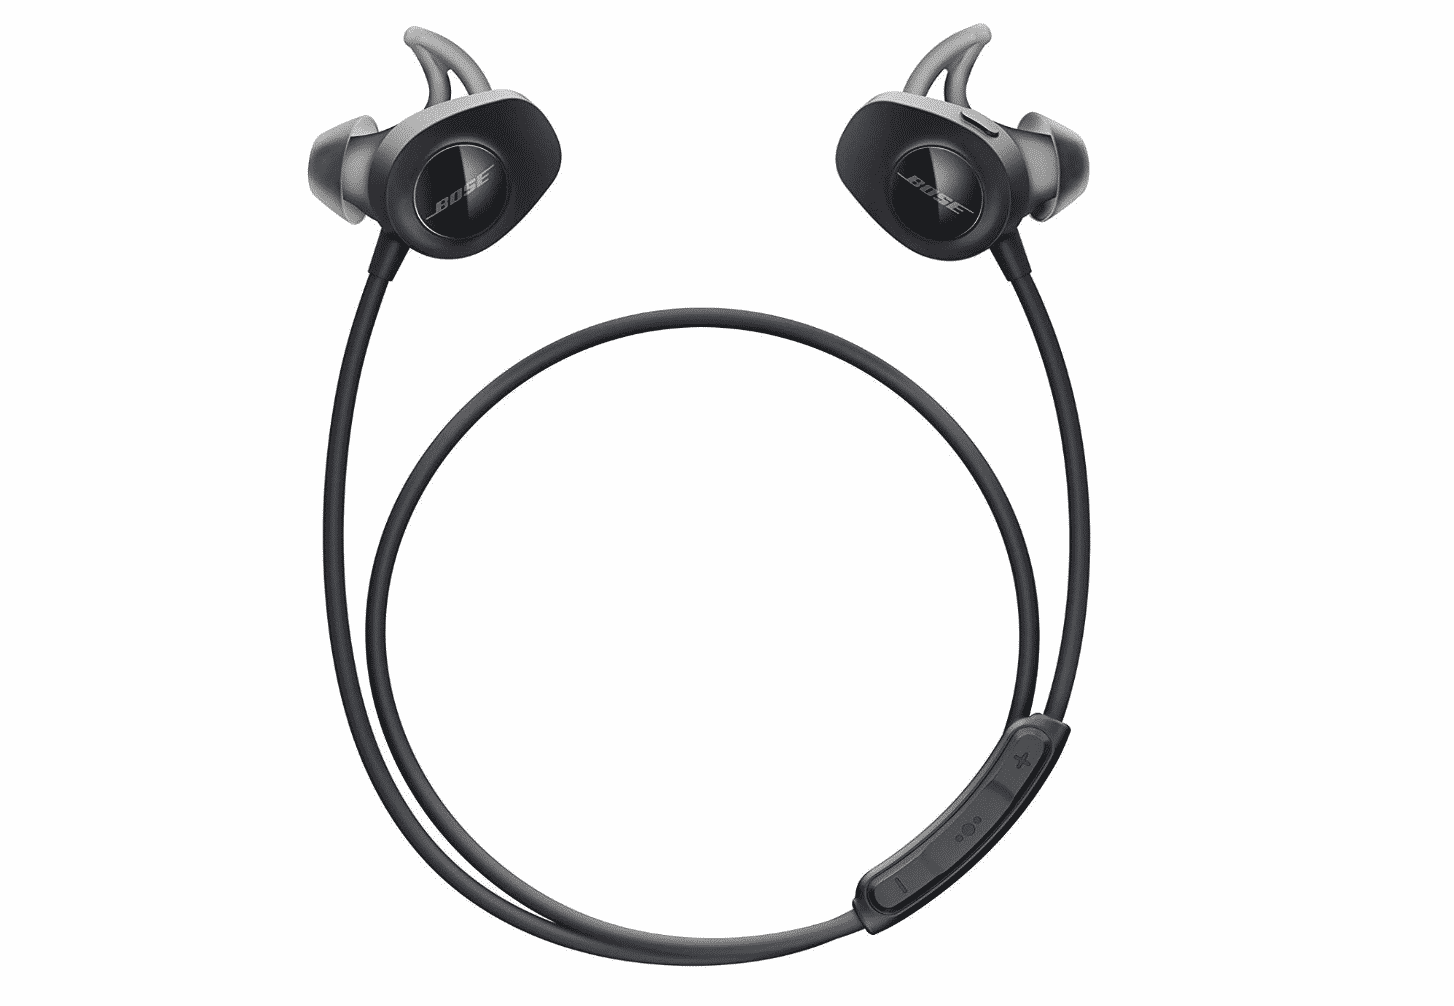 Bose SoundSport Wireless Headphones Drop to $99